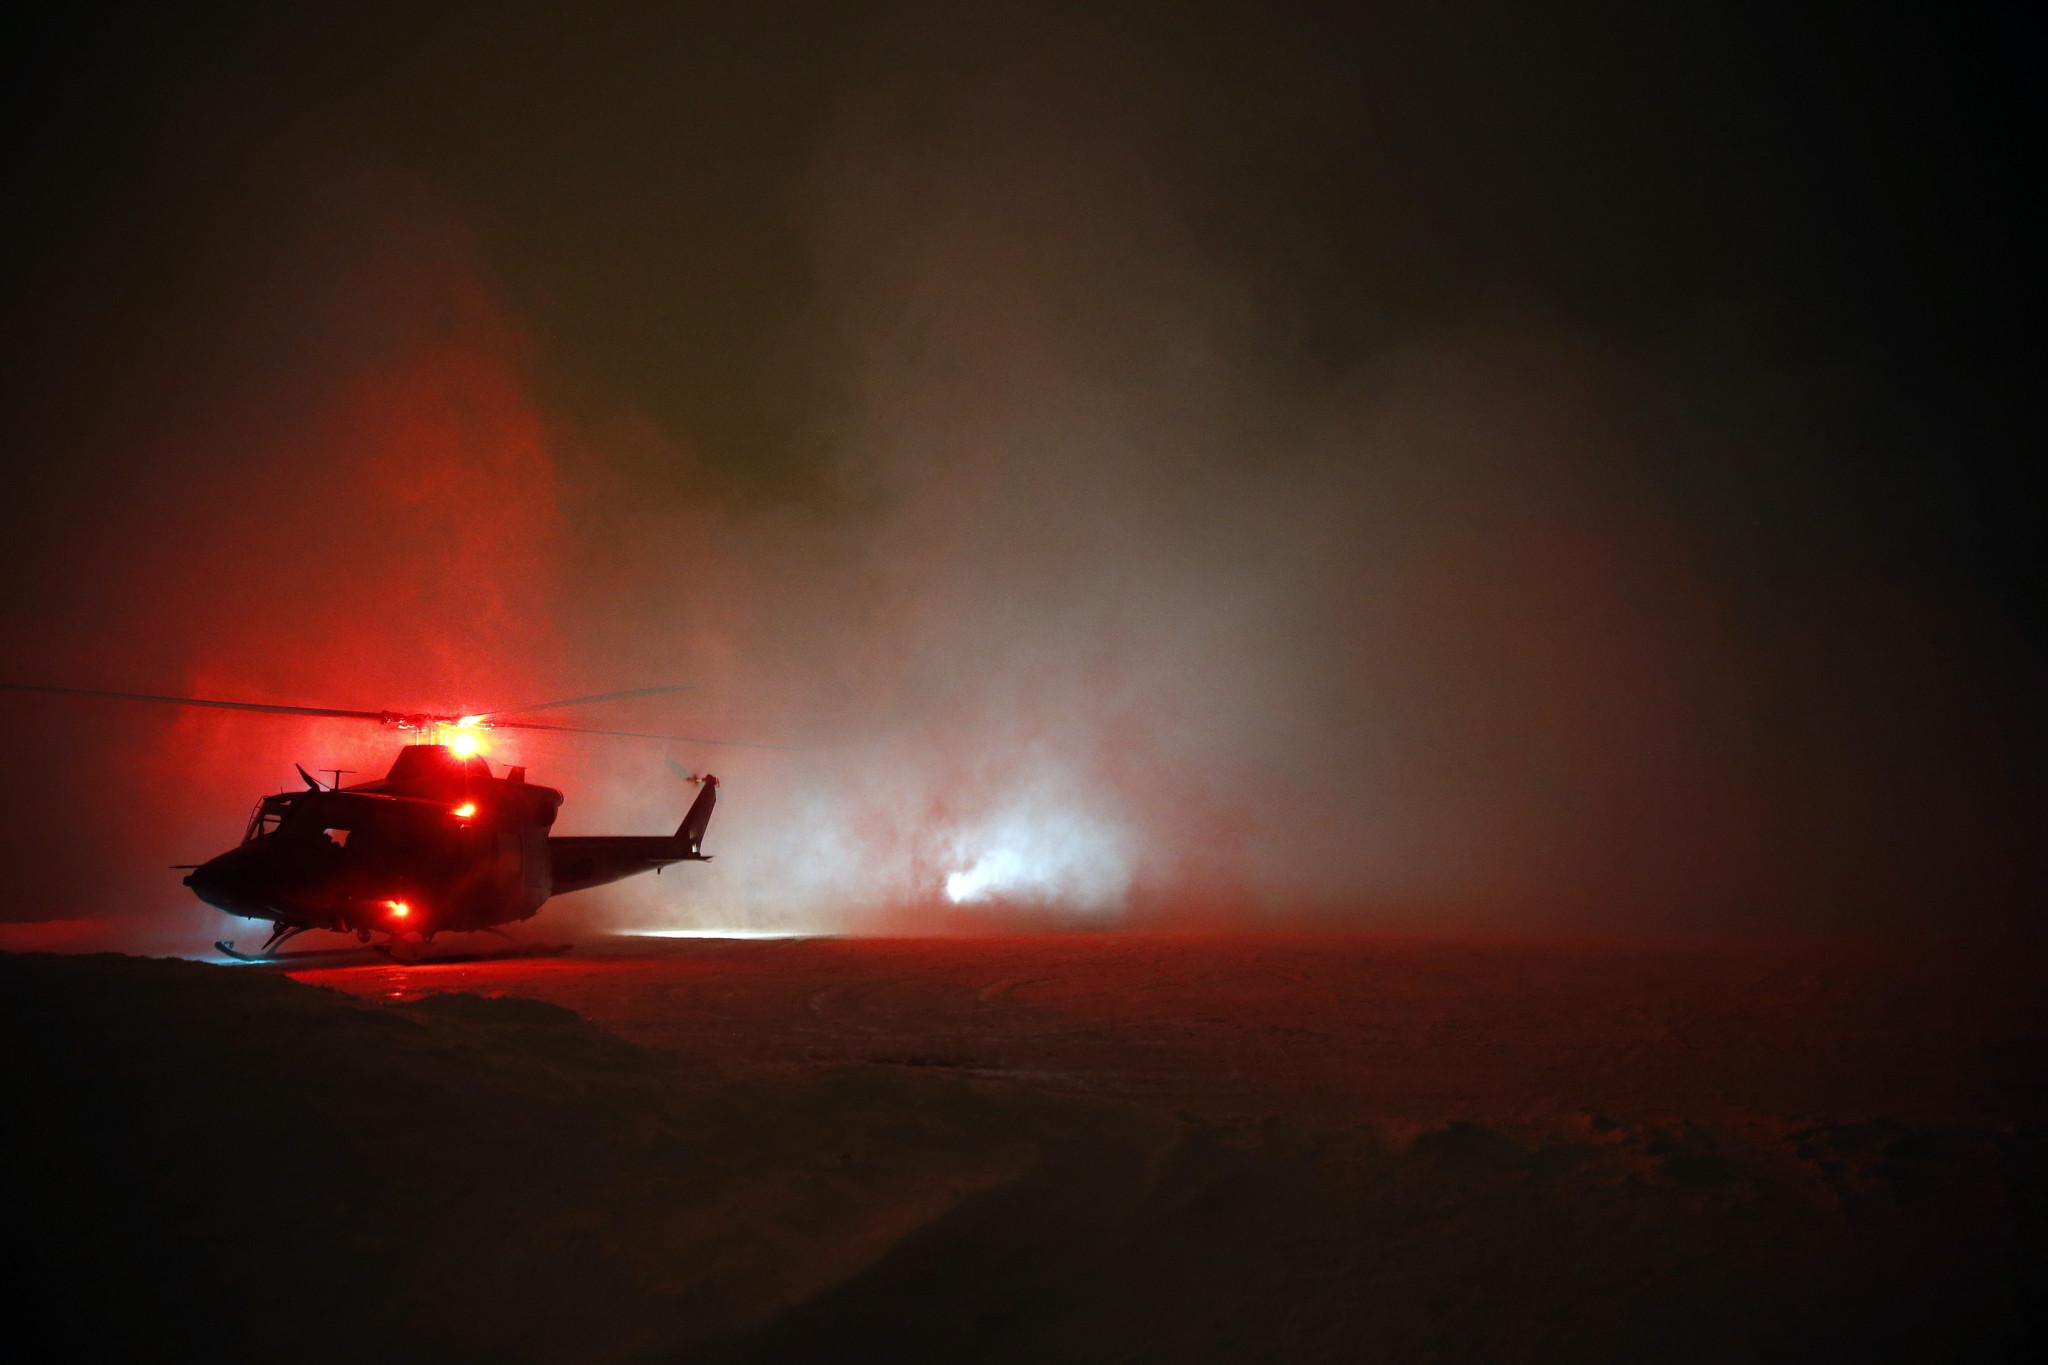 Tre Bell 412 SP helikopter fra 720 skavdronen under trening på Rena. Foto: TORBJØRN KJOSVOLD/FORSVARET